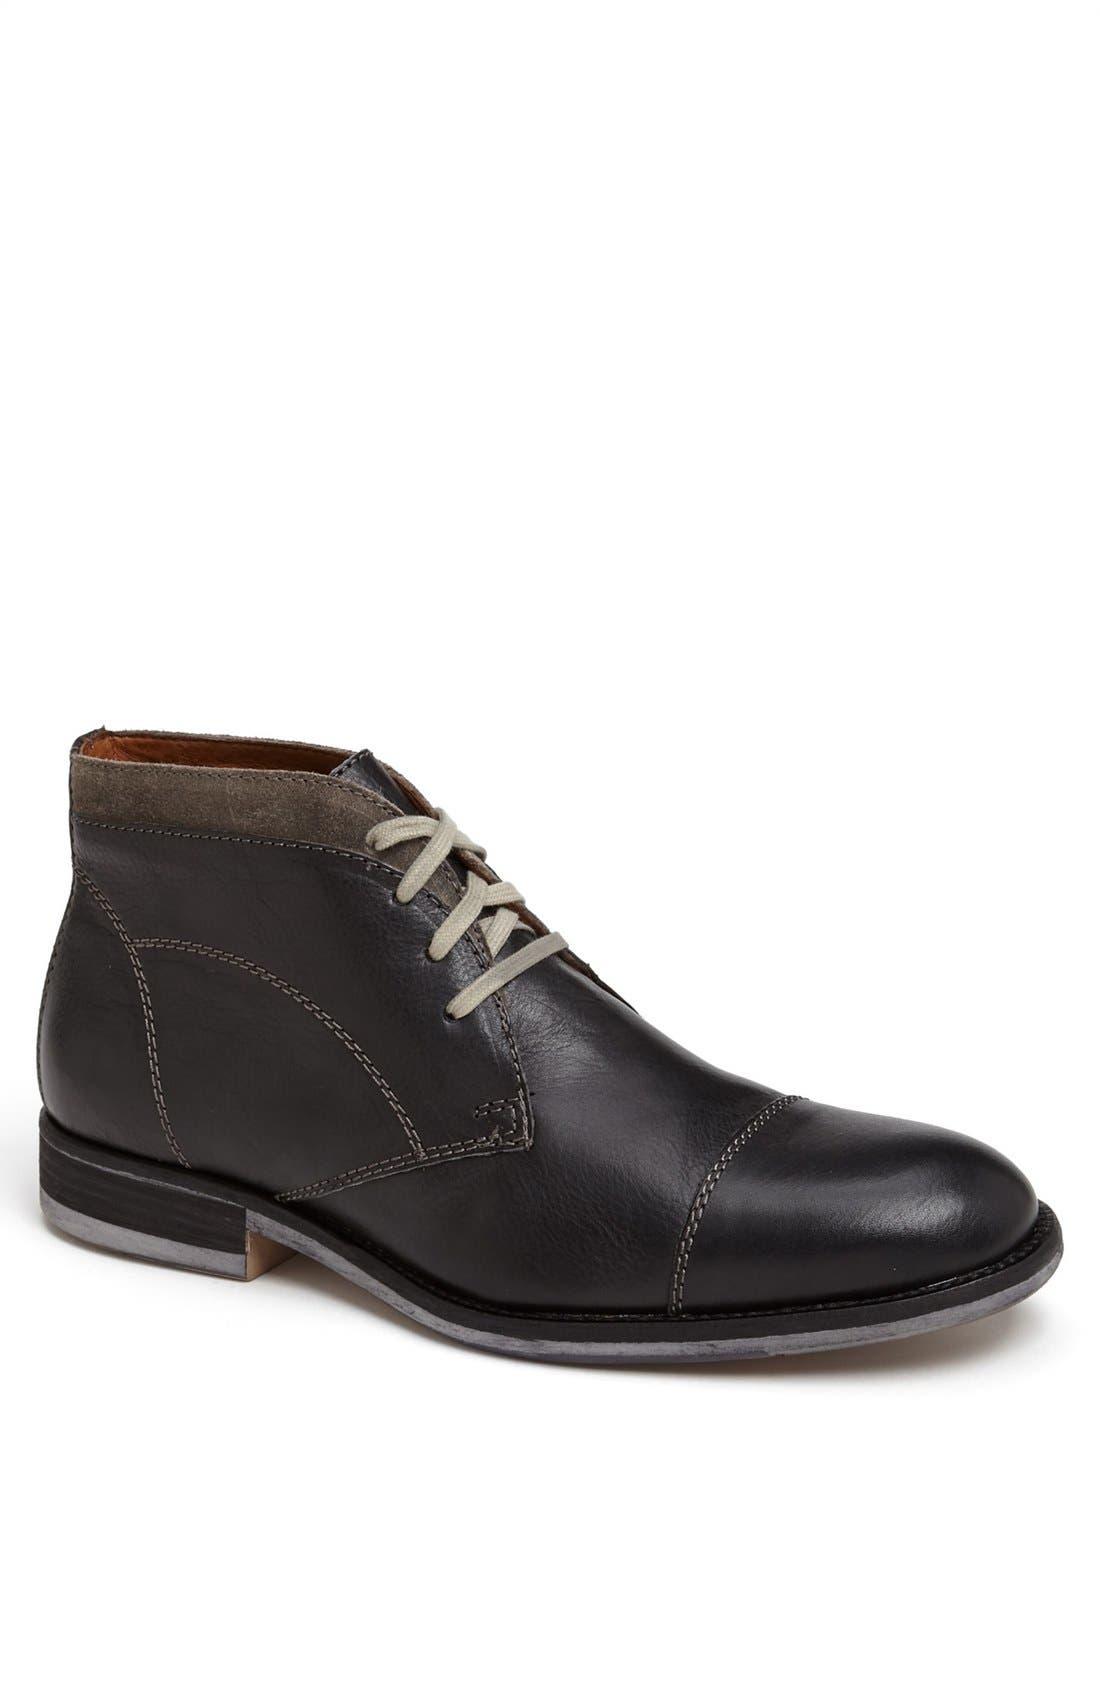 Main Image - J&M 1850 'Decatur' Chukka Boot (Men)